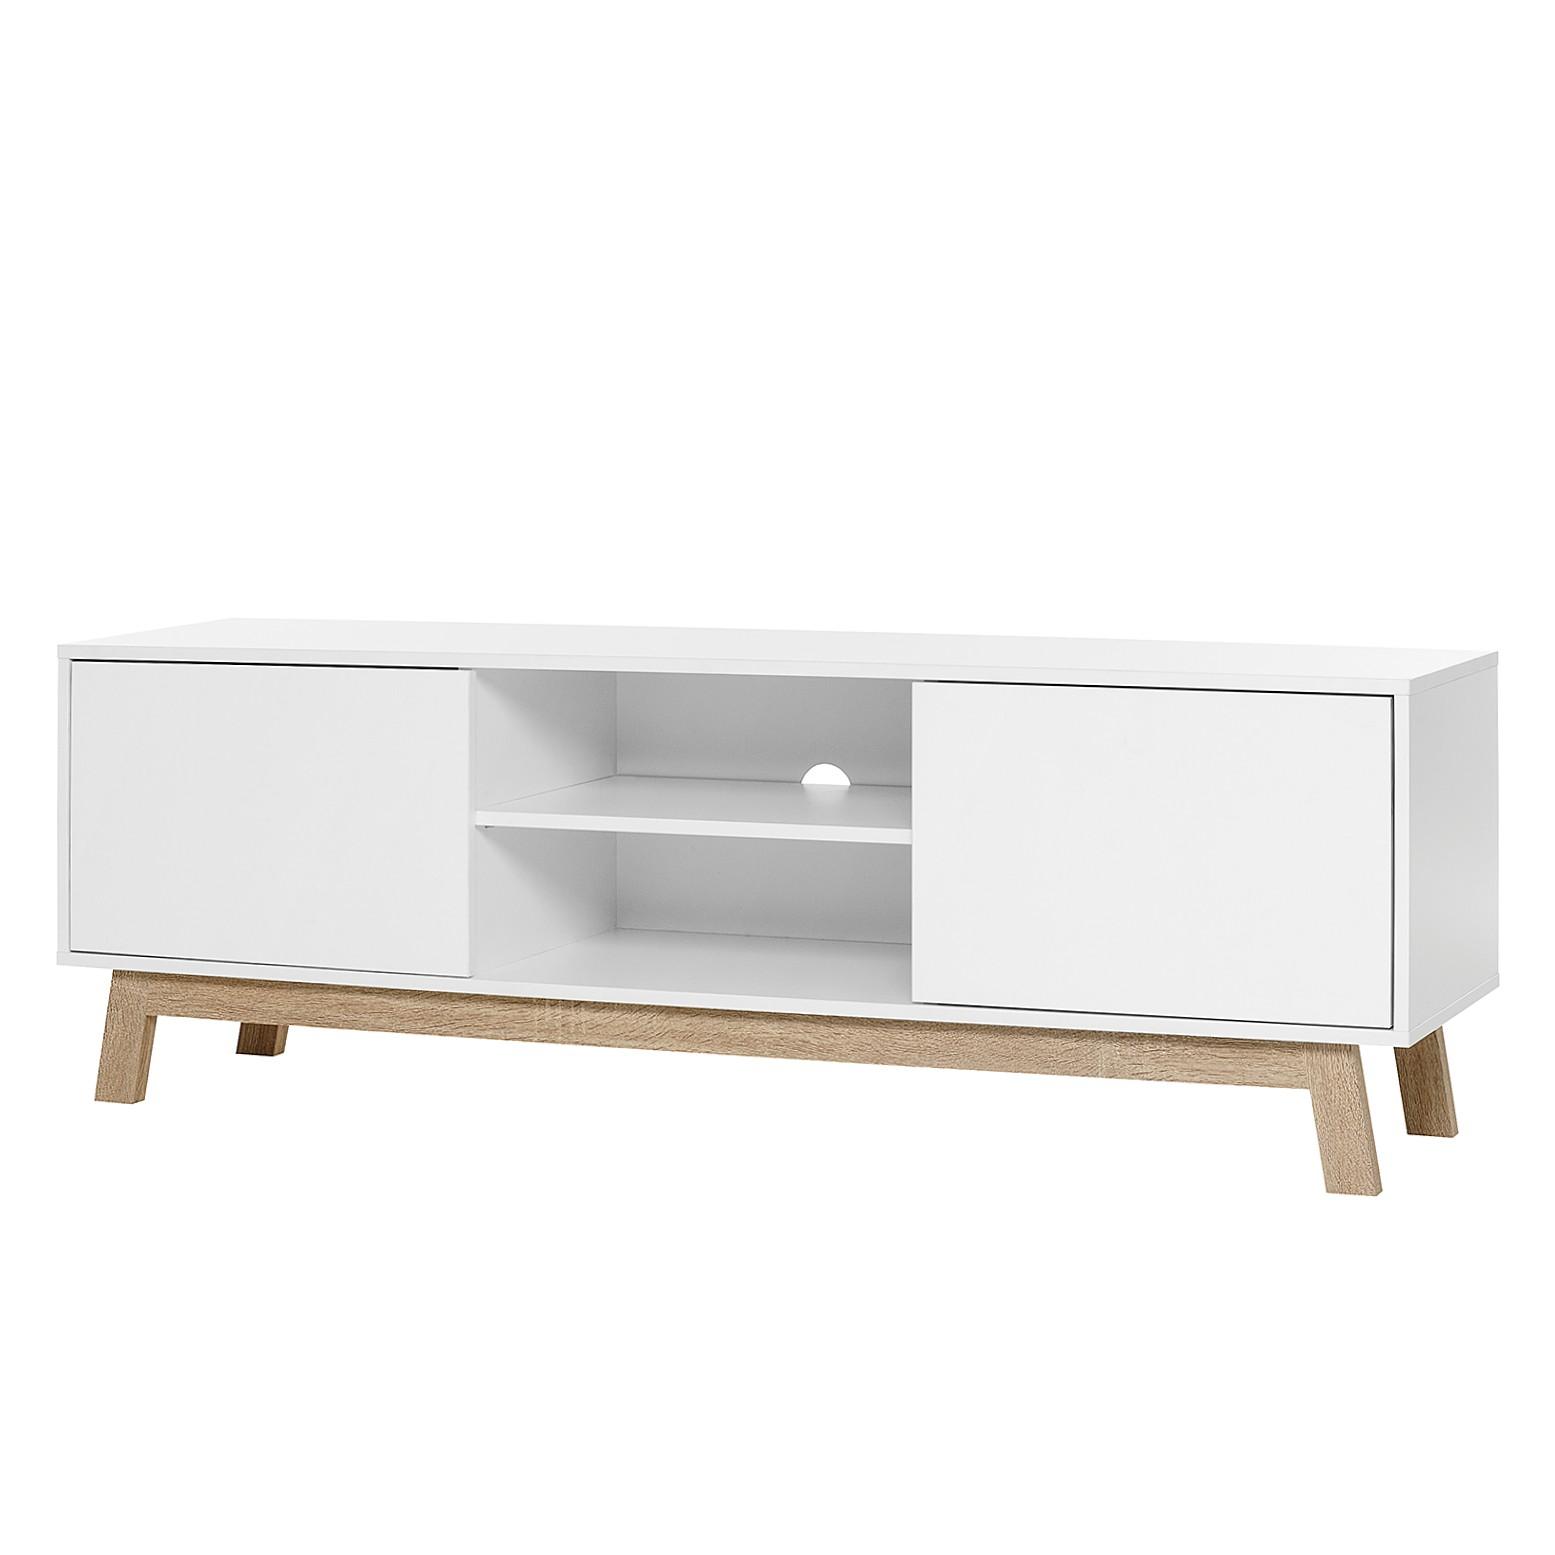 Meuble TV Storberg II - Blanc mat / Imitation chêne Sonoma, mooved